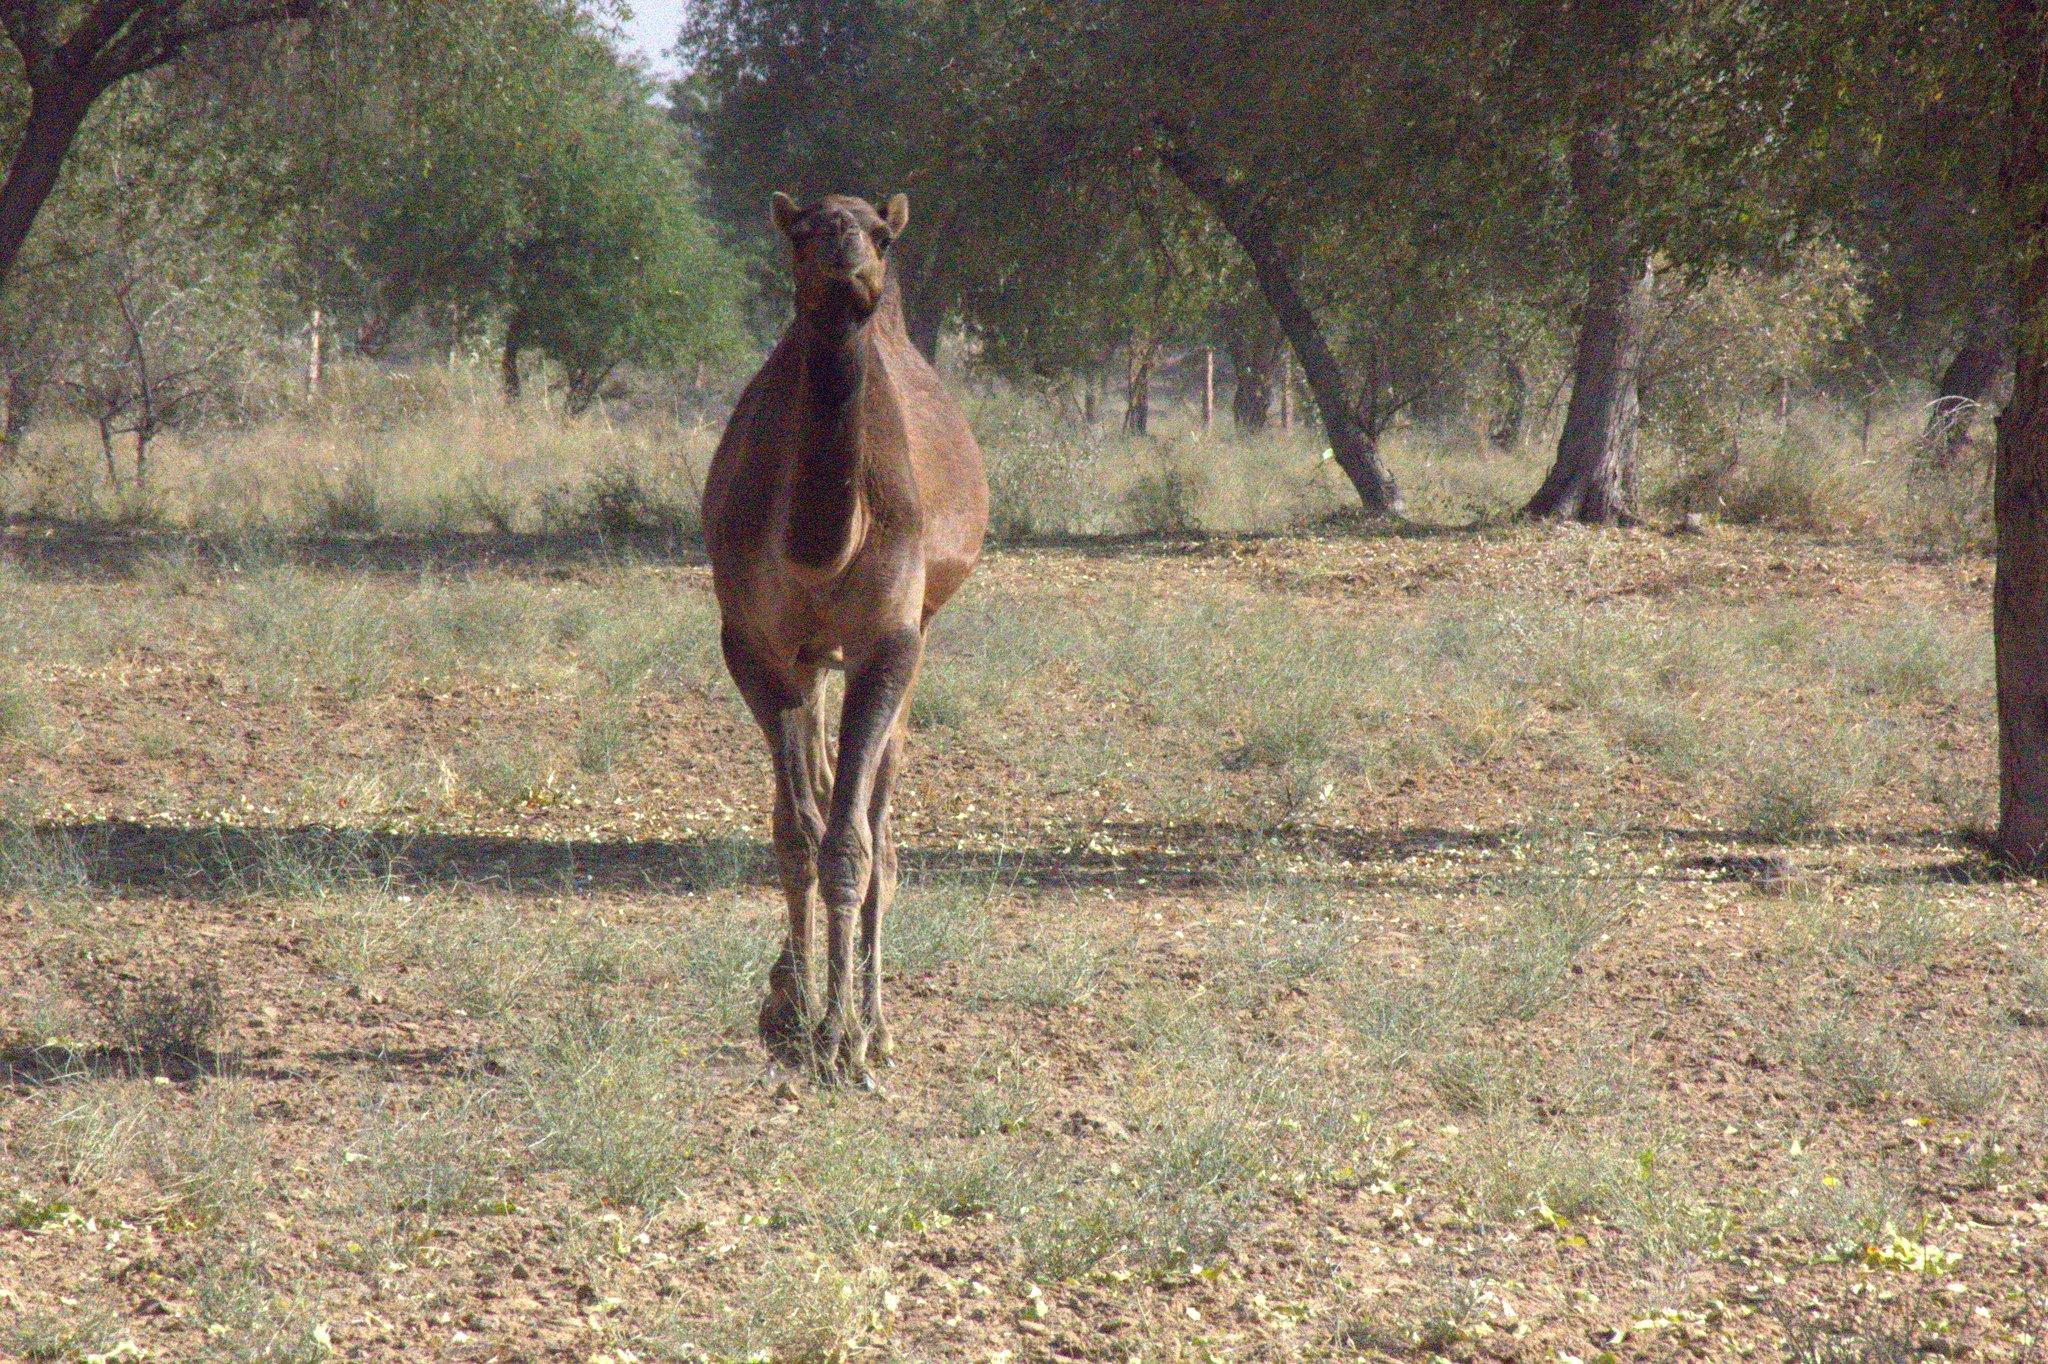 Camel at Salawas village